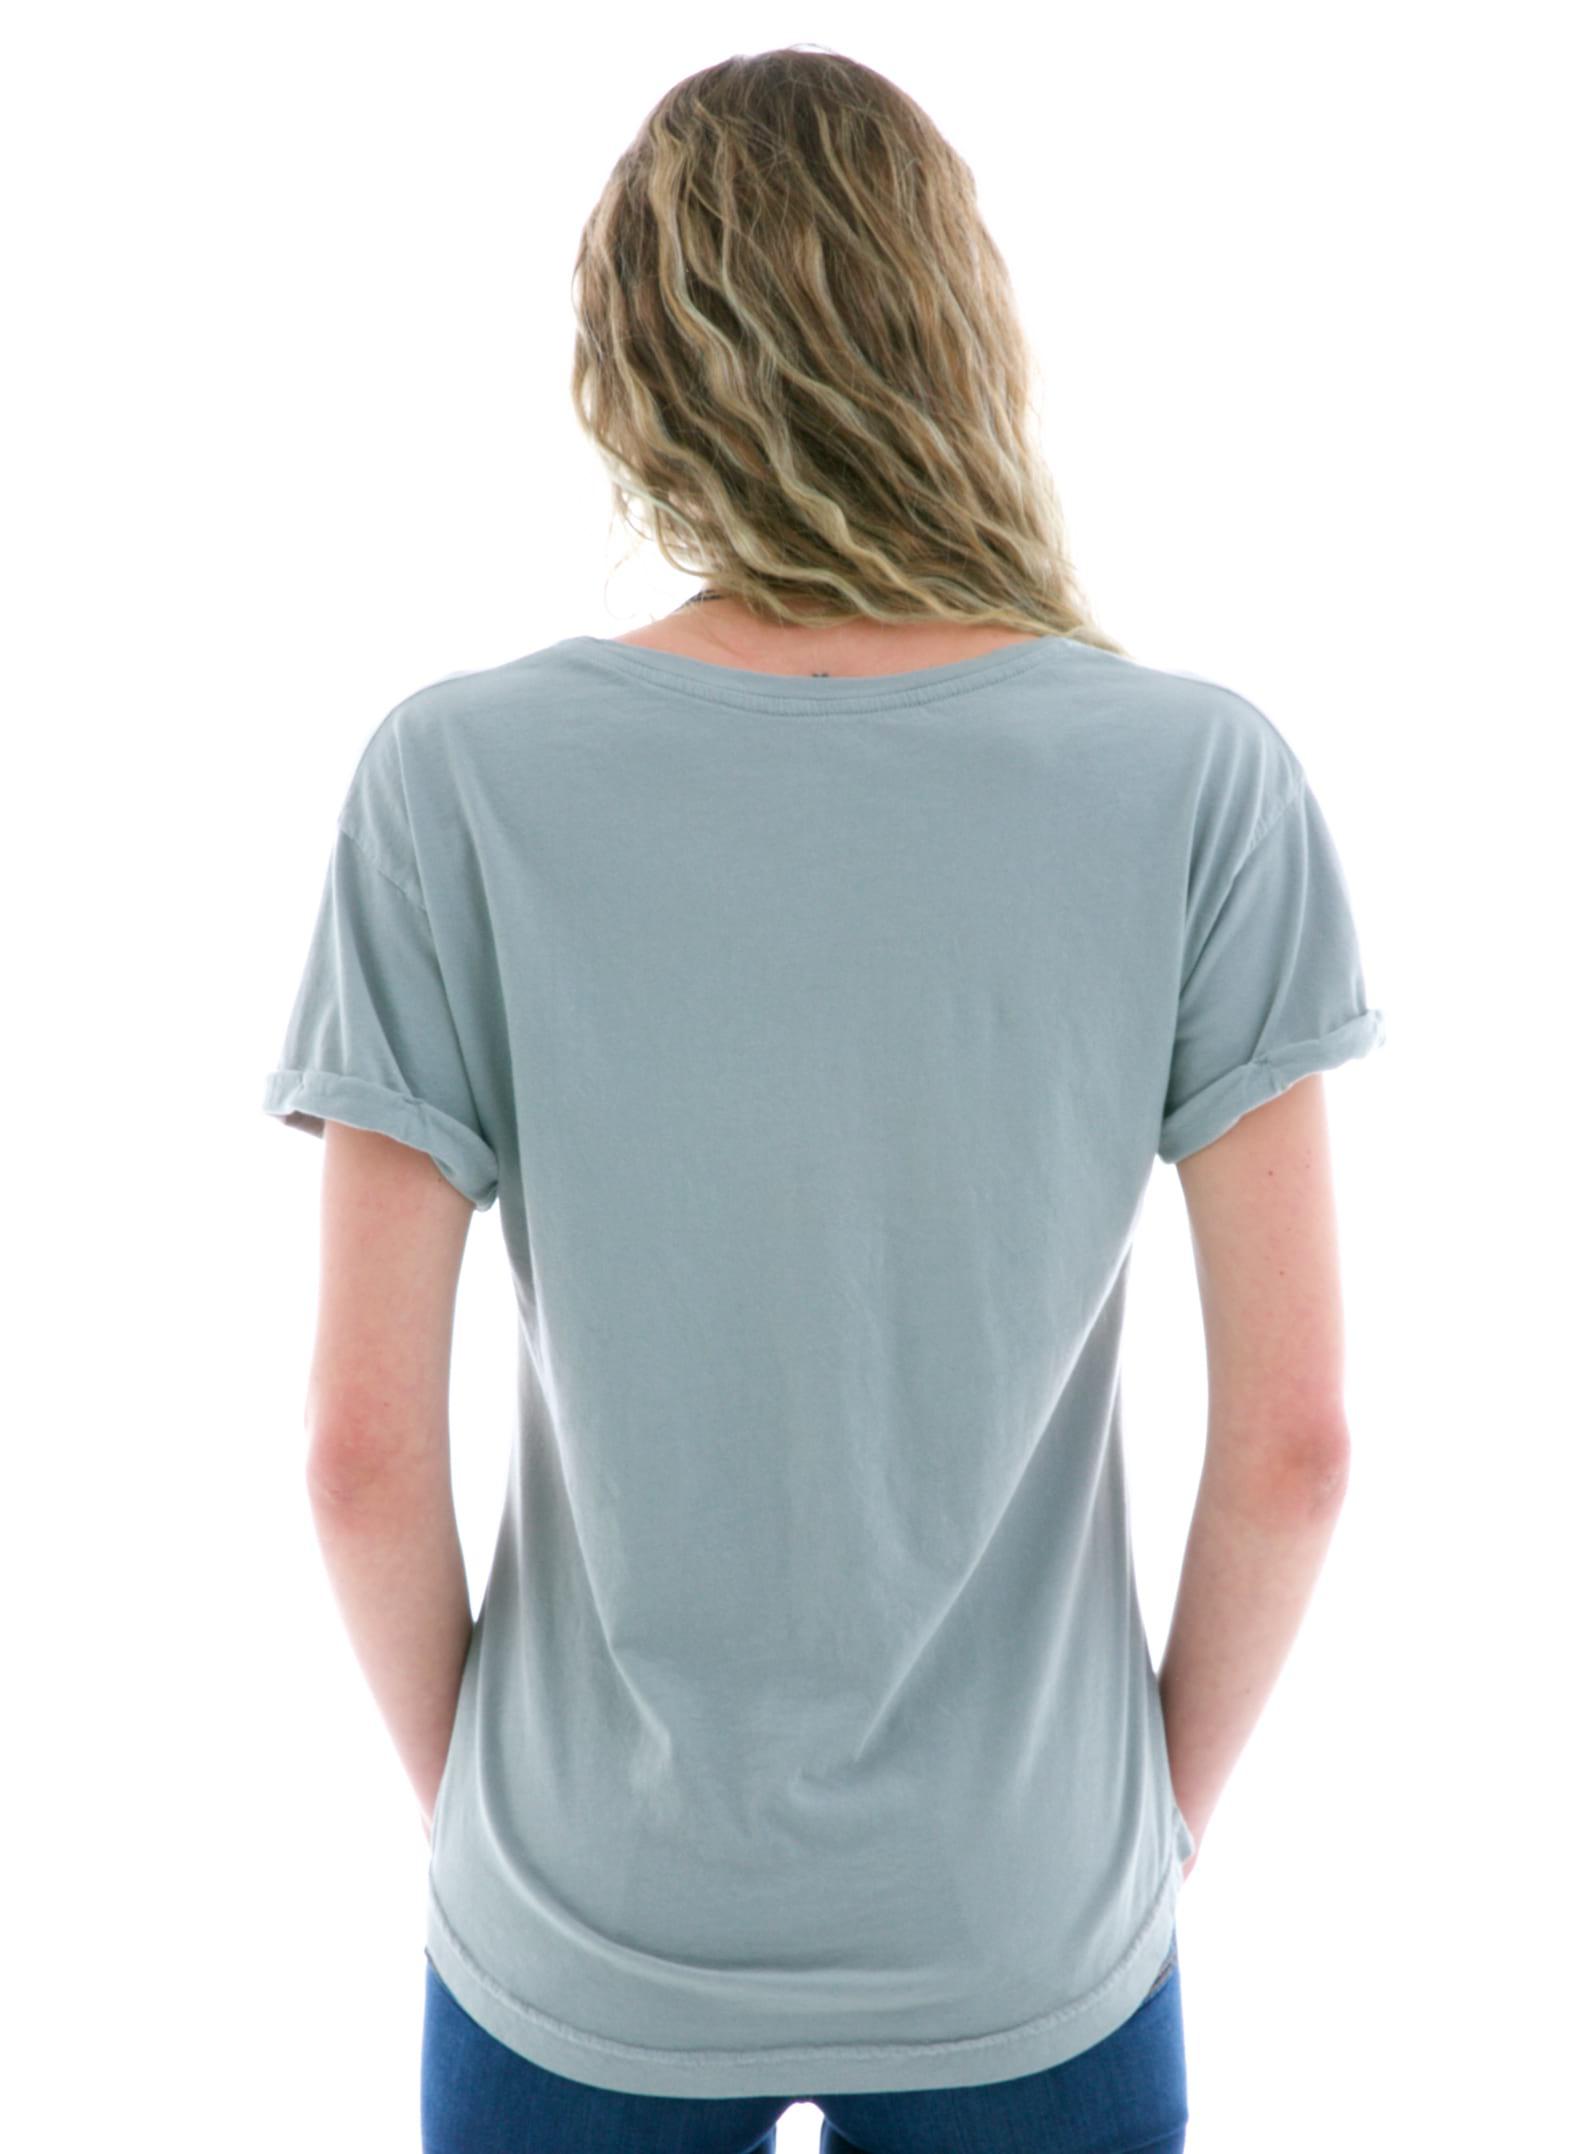 Rollup Custom Printed T-Shirt